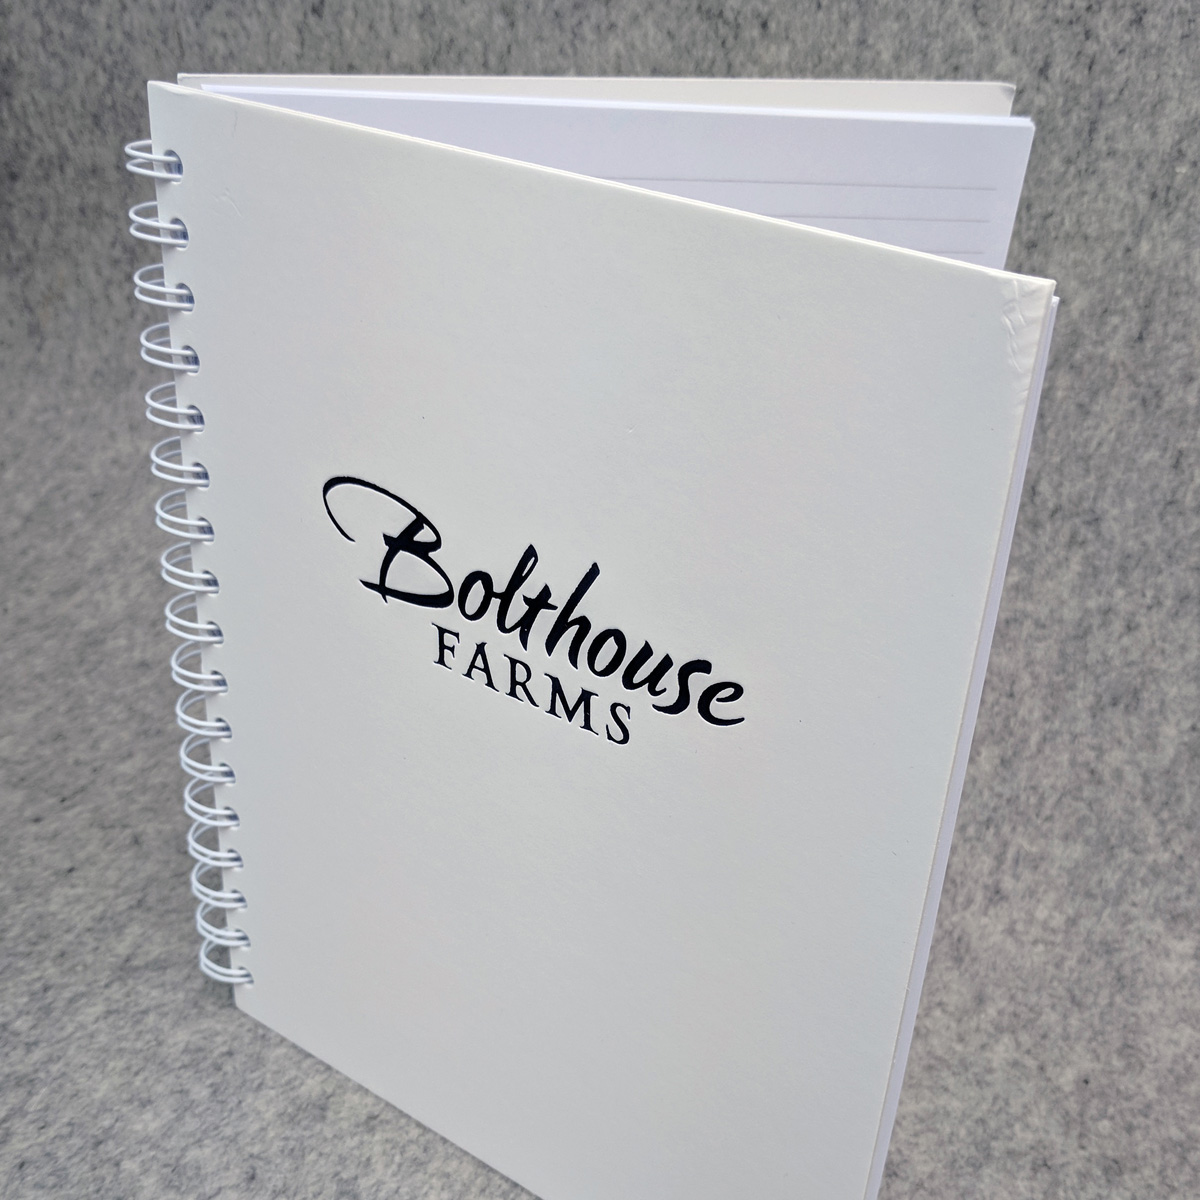 WhiteBook.jpg